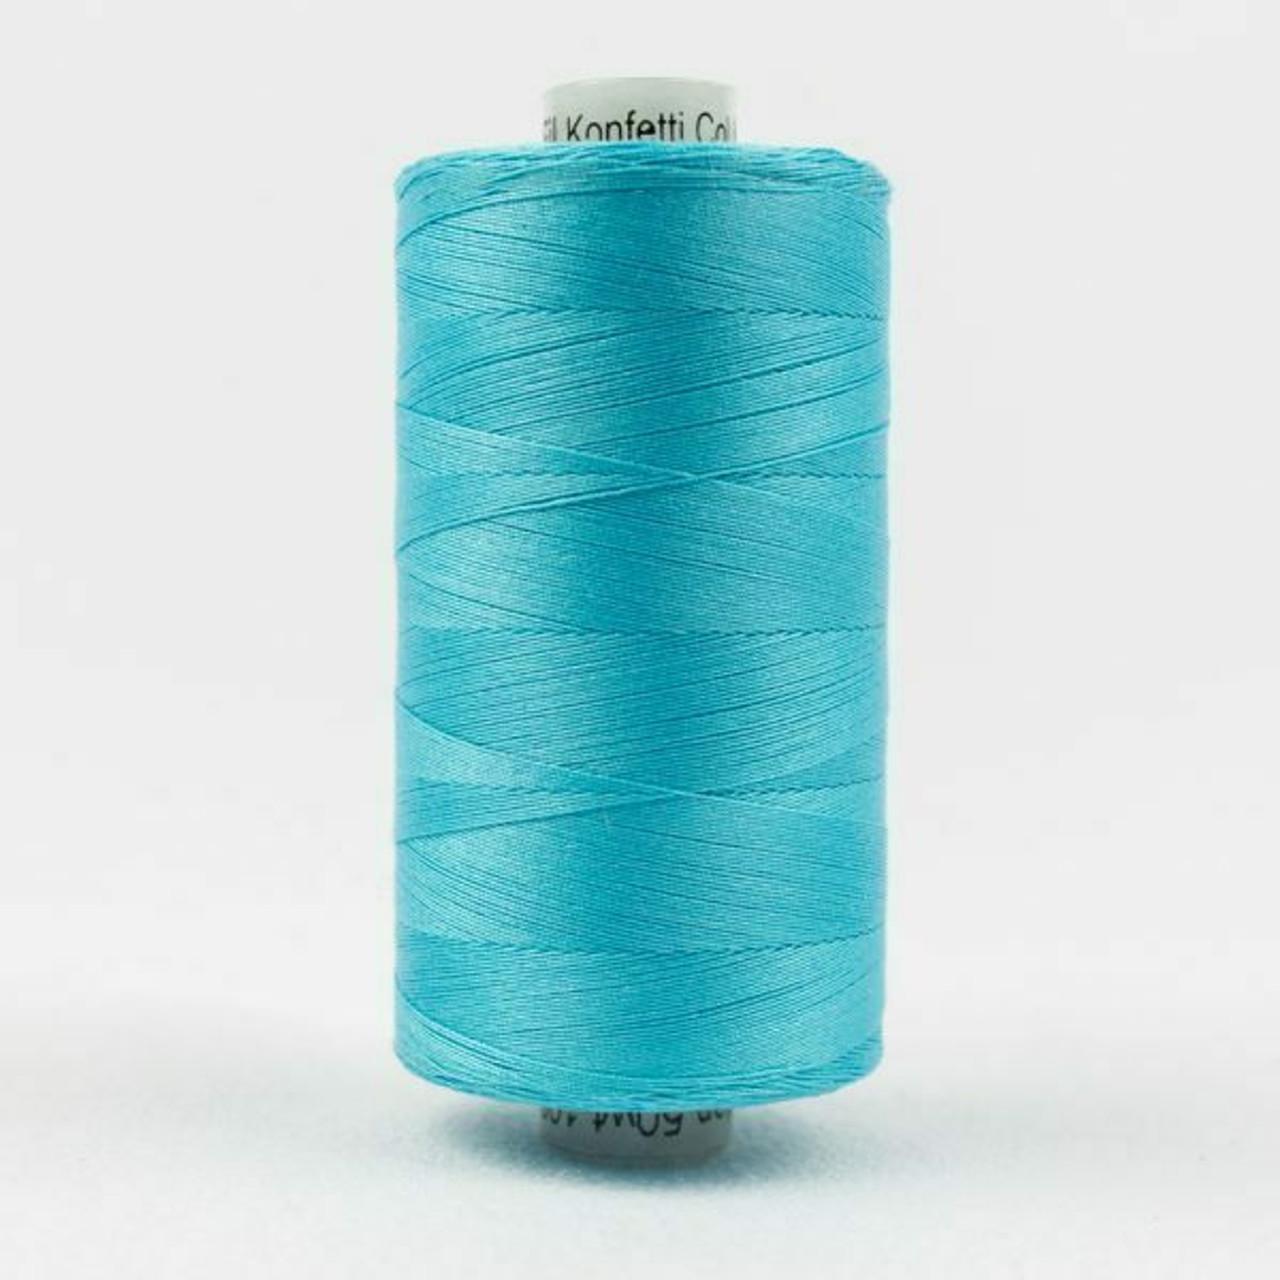 Konfetti - Medium Peacock Blue